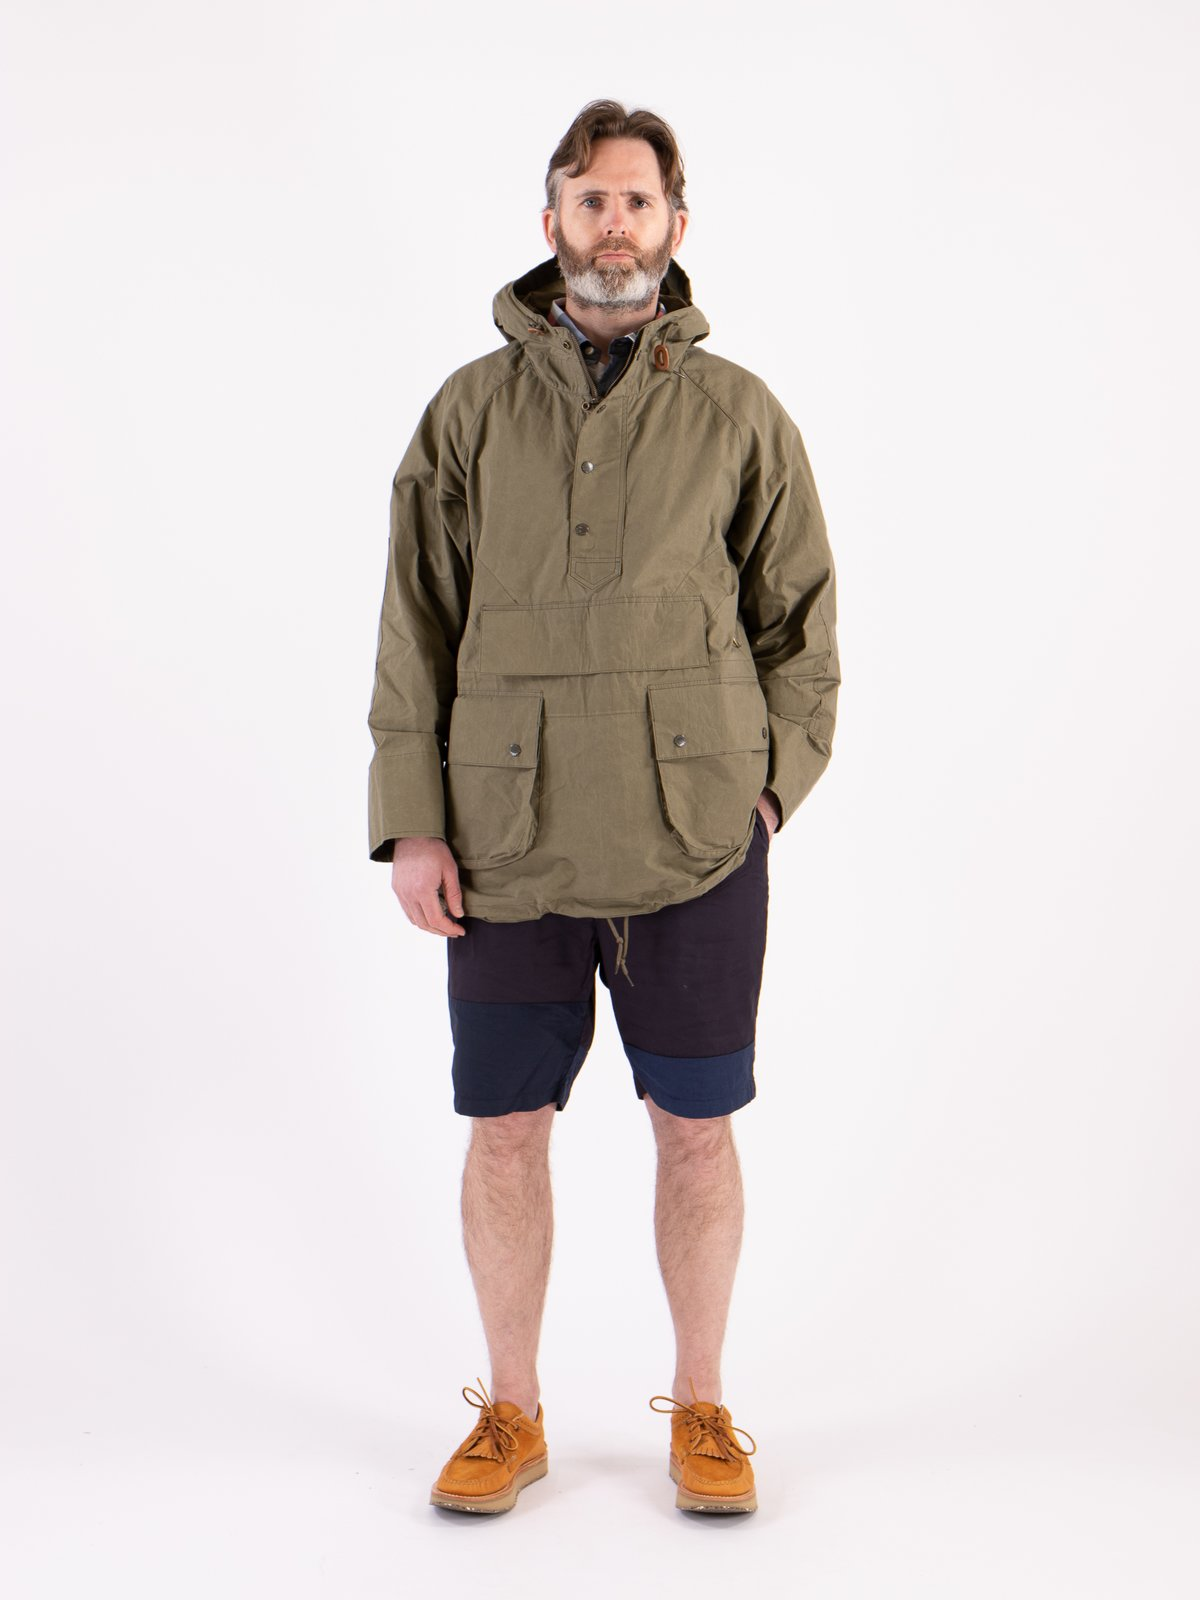 Olive Warby Jacket - Image 2